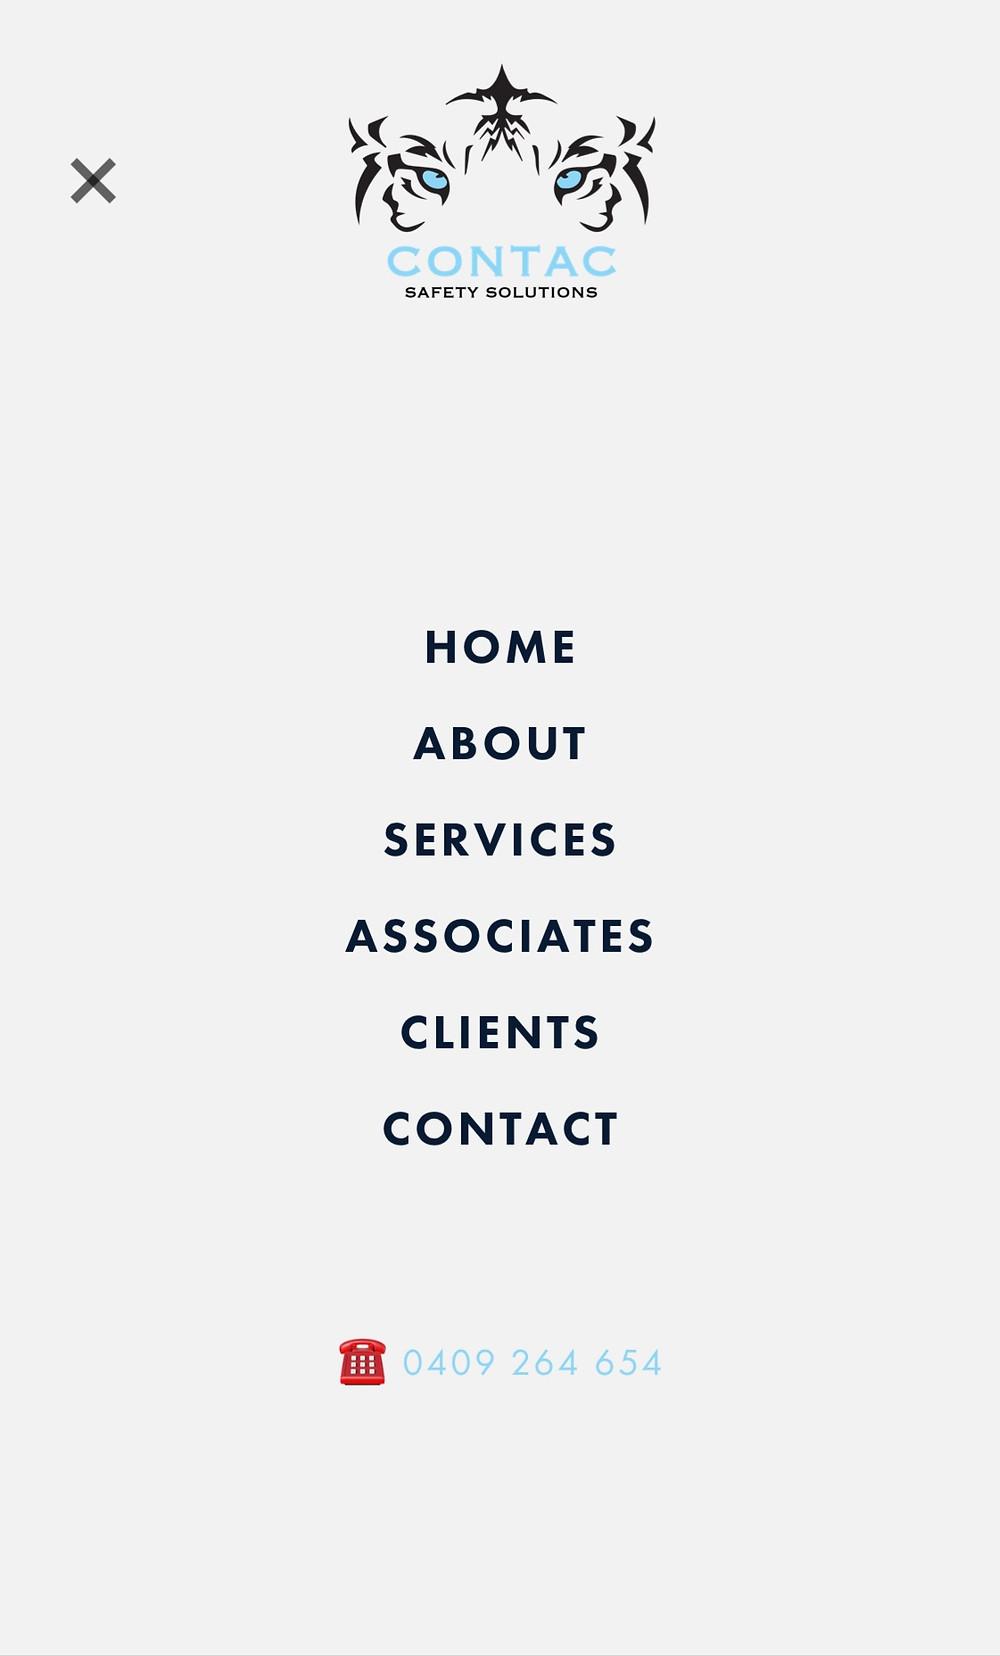 website design - RESPONSIVE MENU